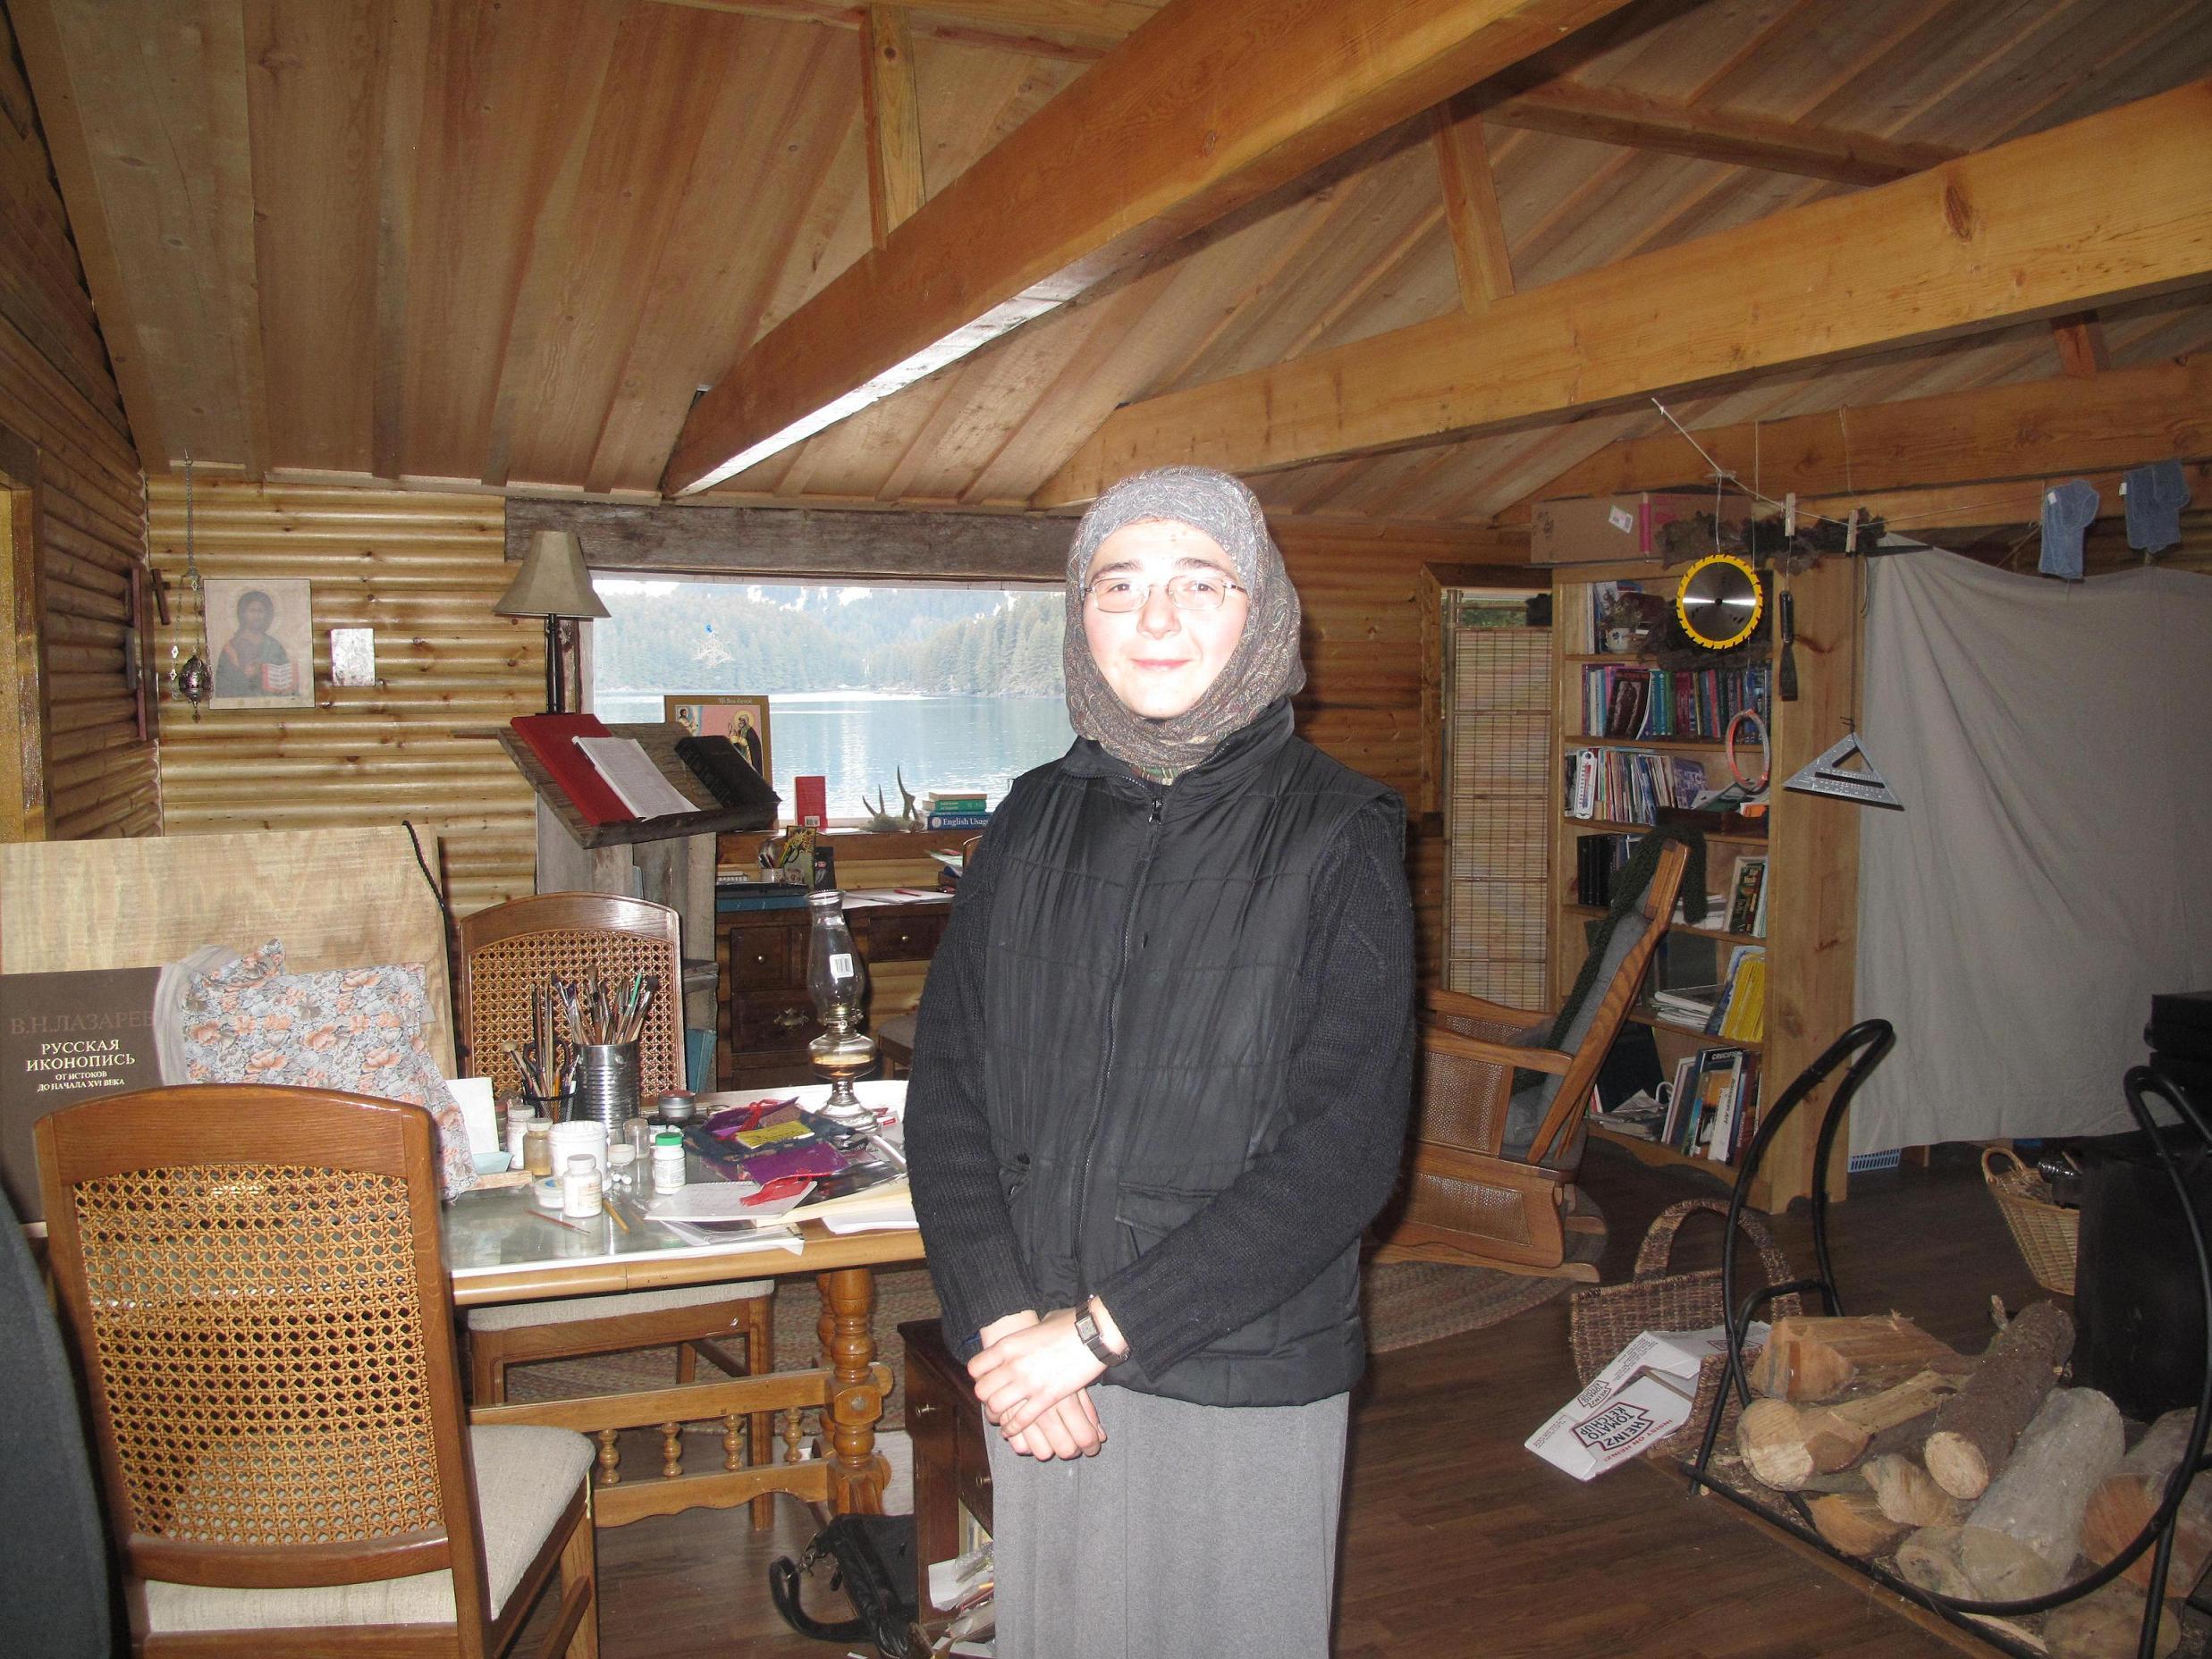 12 sora sosita din Rusia